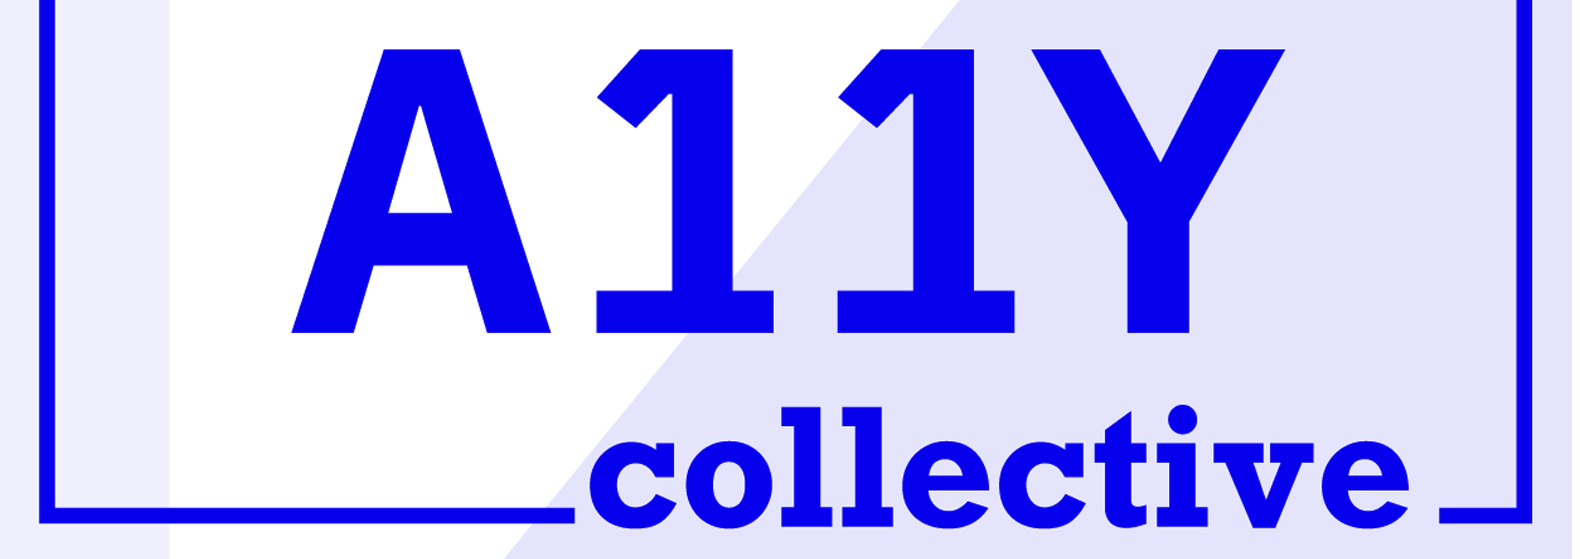 The A11y Collective logo